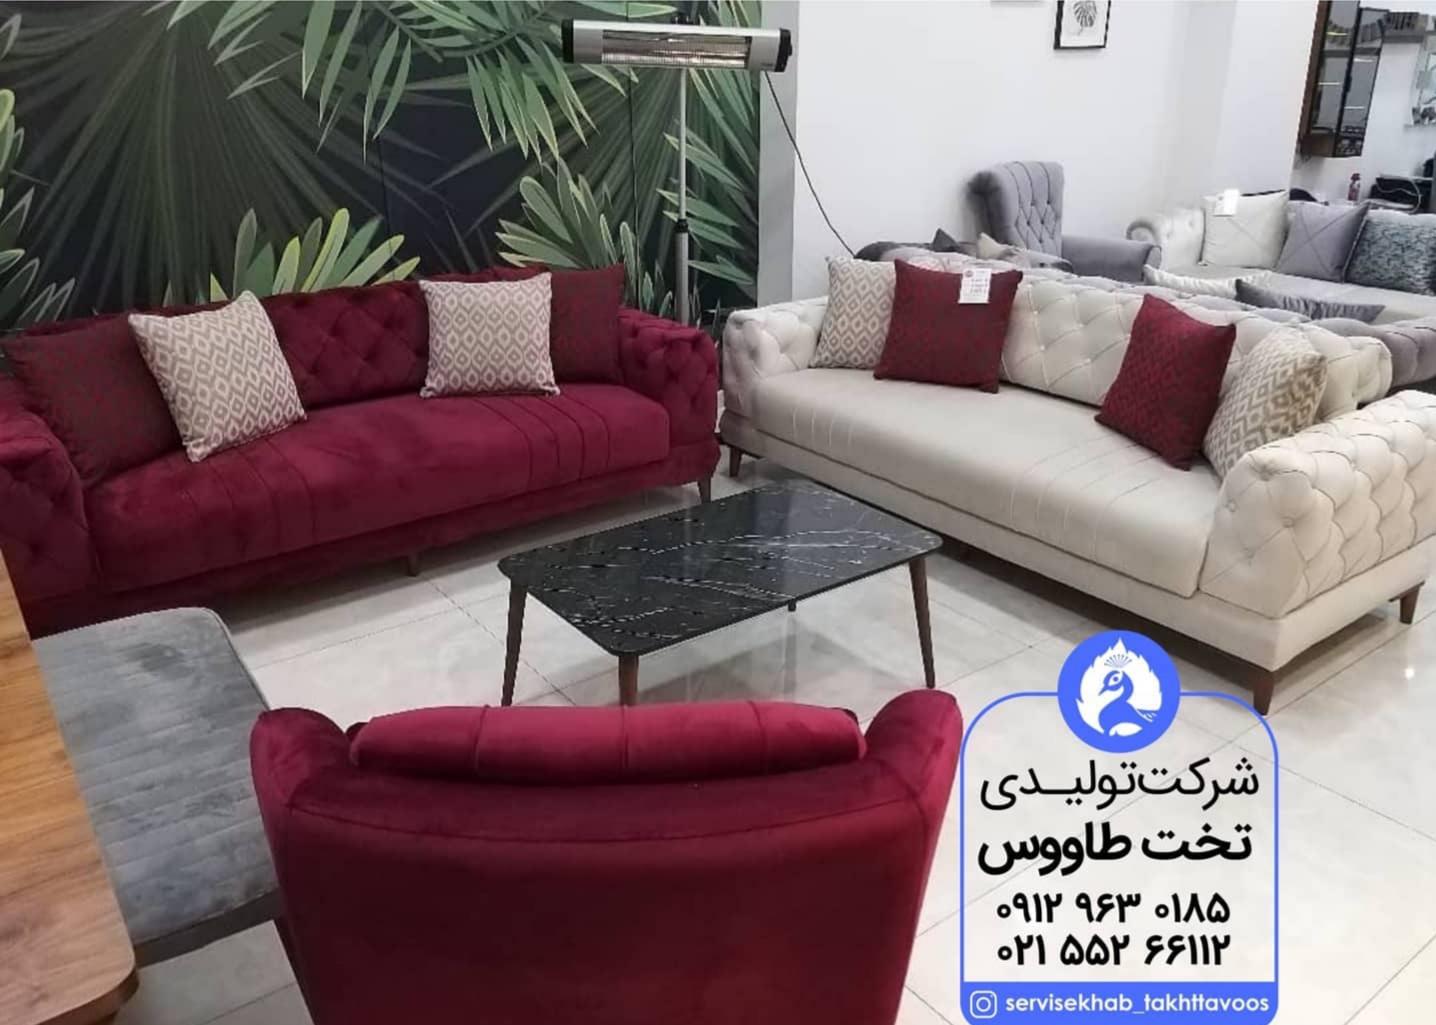 servicekhab_takhttavoos-20210909-0044